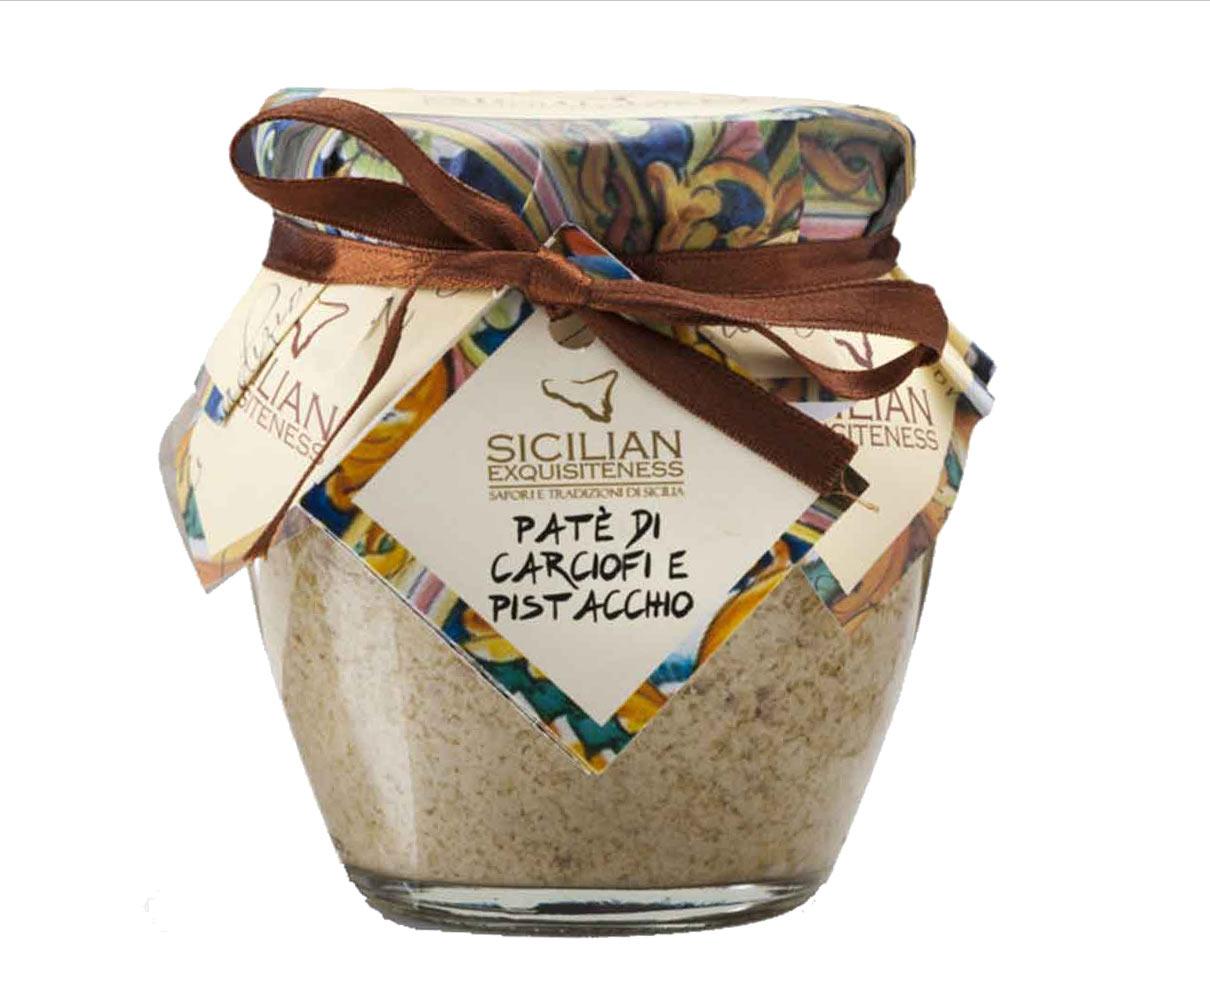 Pate' di carciofi e pistacchio Daidone 180gr